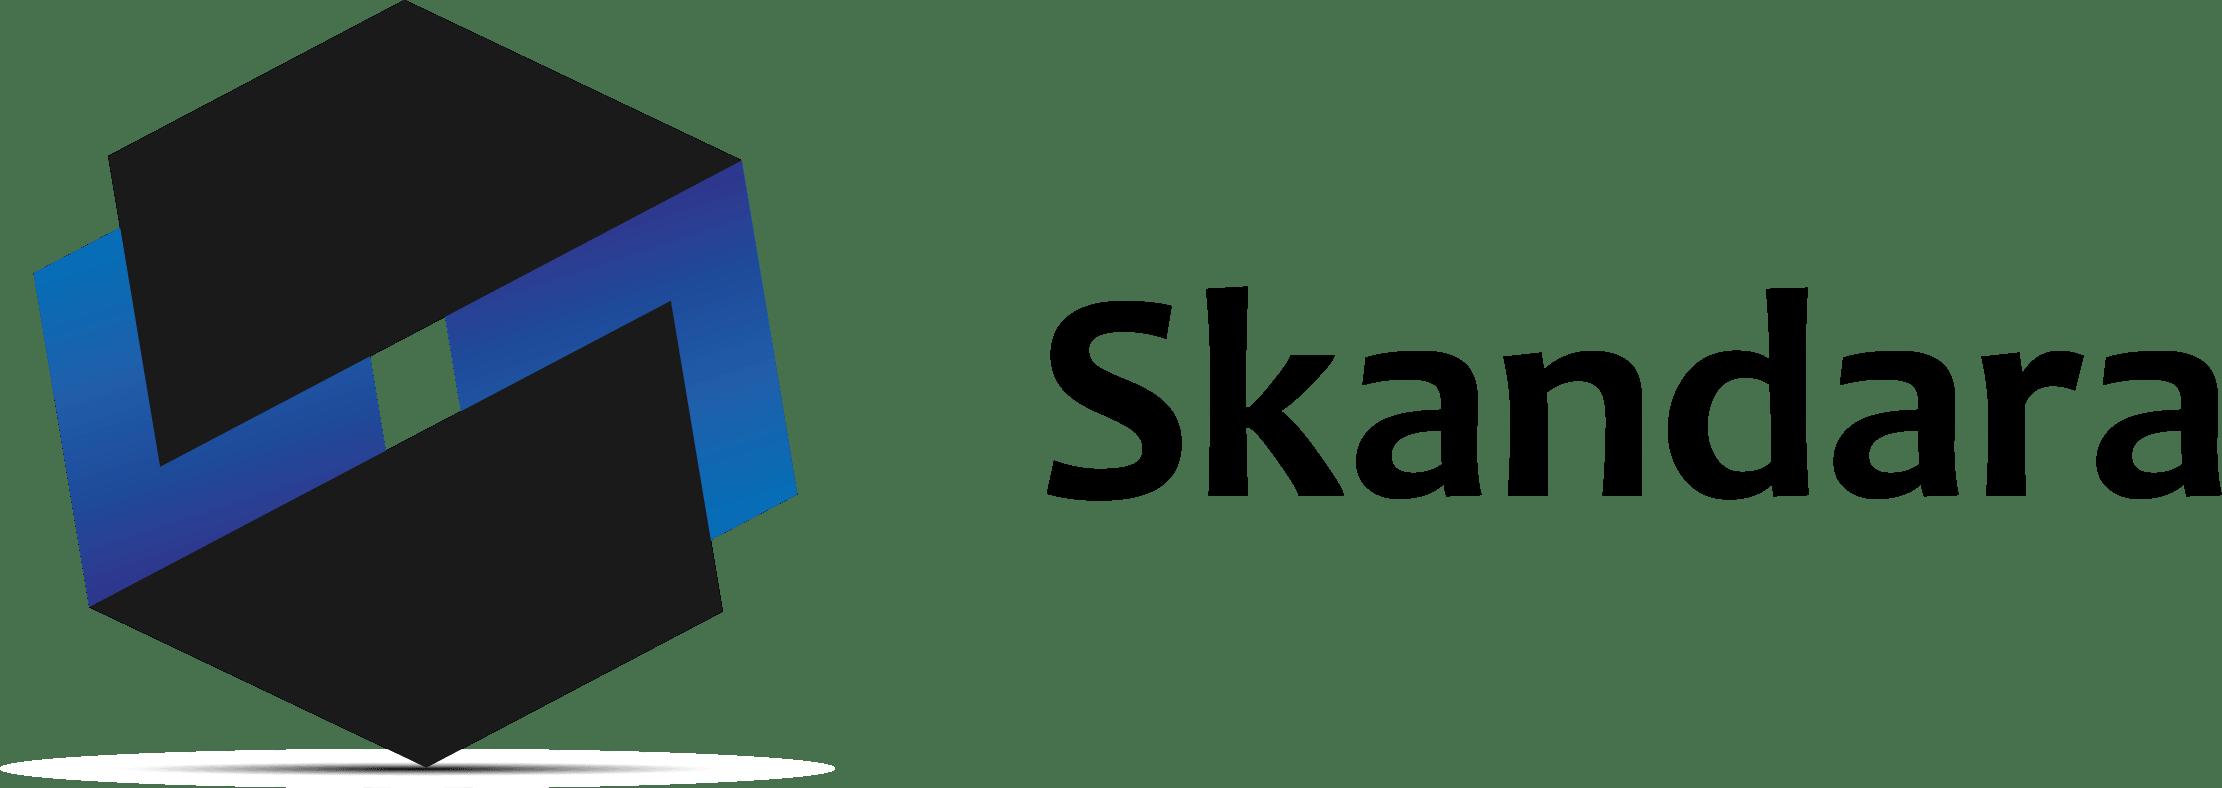 logo-skandara